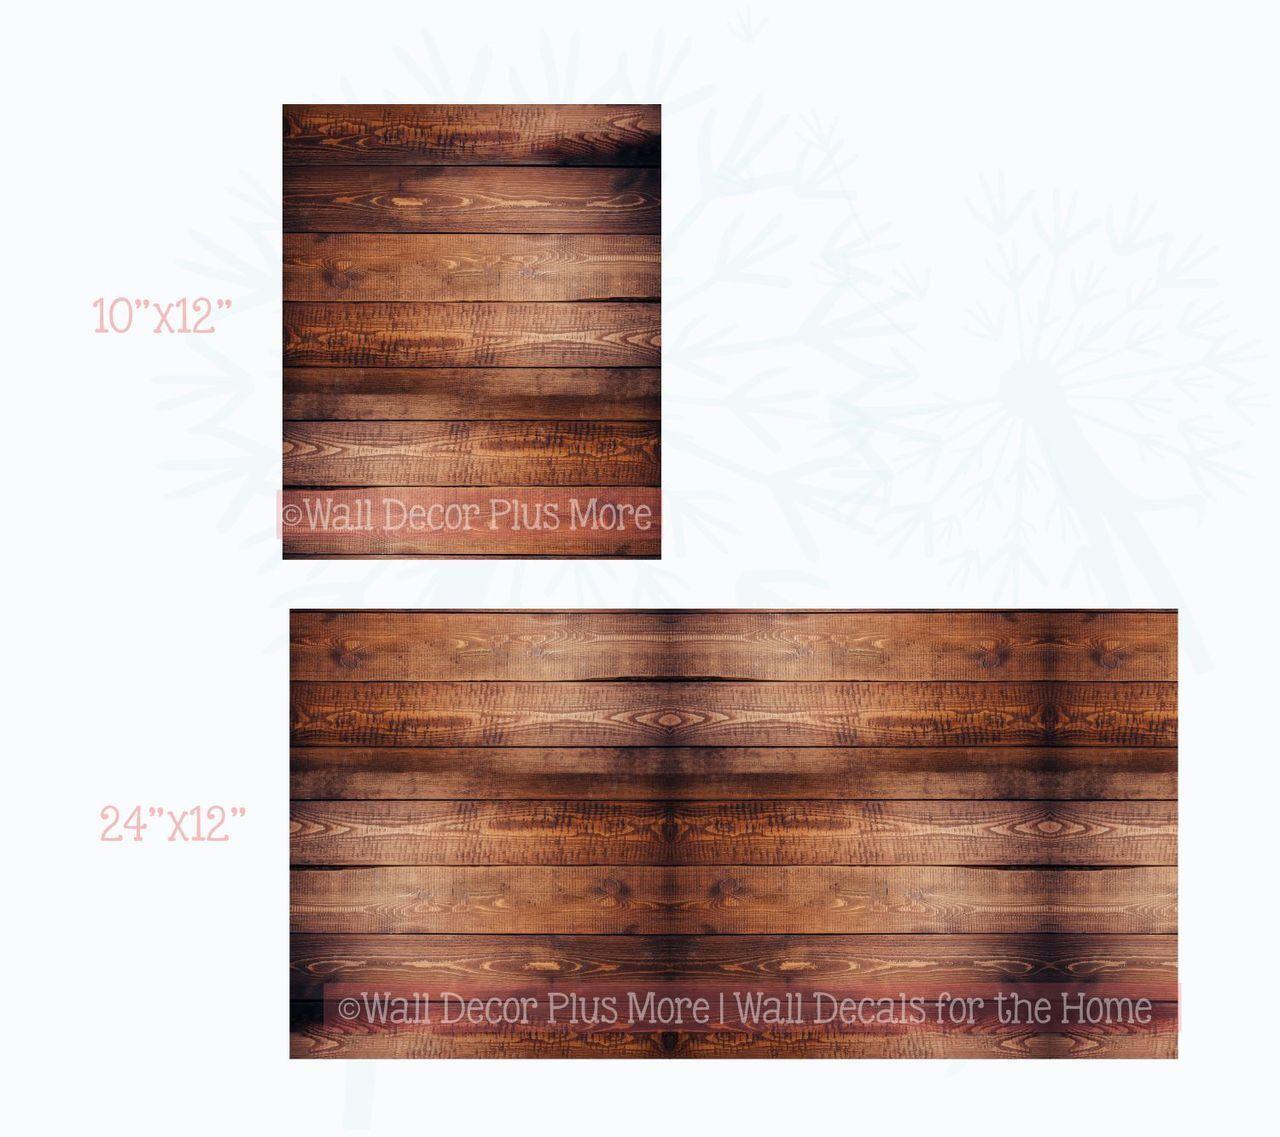 High Glossy Car Interior Wood Textured Grain Vinyl Wrap Sticker Decals 0 3x1 24m Price 15 18 Free Shipping Hashtag3 Car Interior Wood Vinyl Vinyl Wrap [ 1000 x 1000 Pixel ]